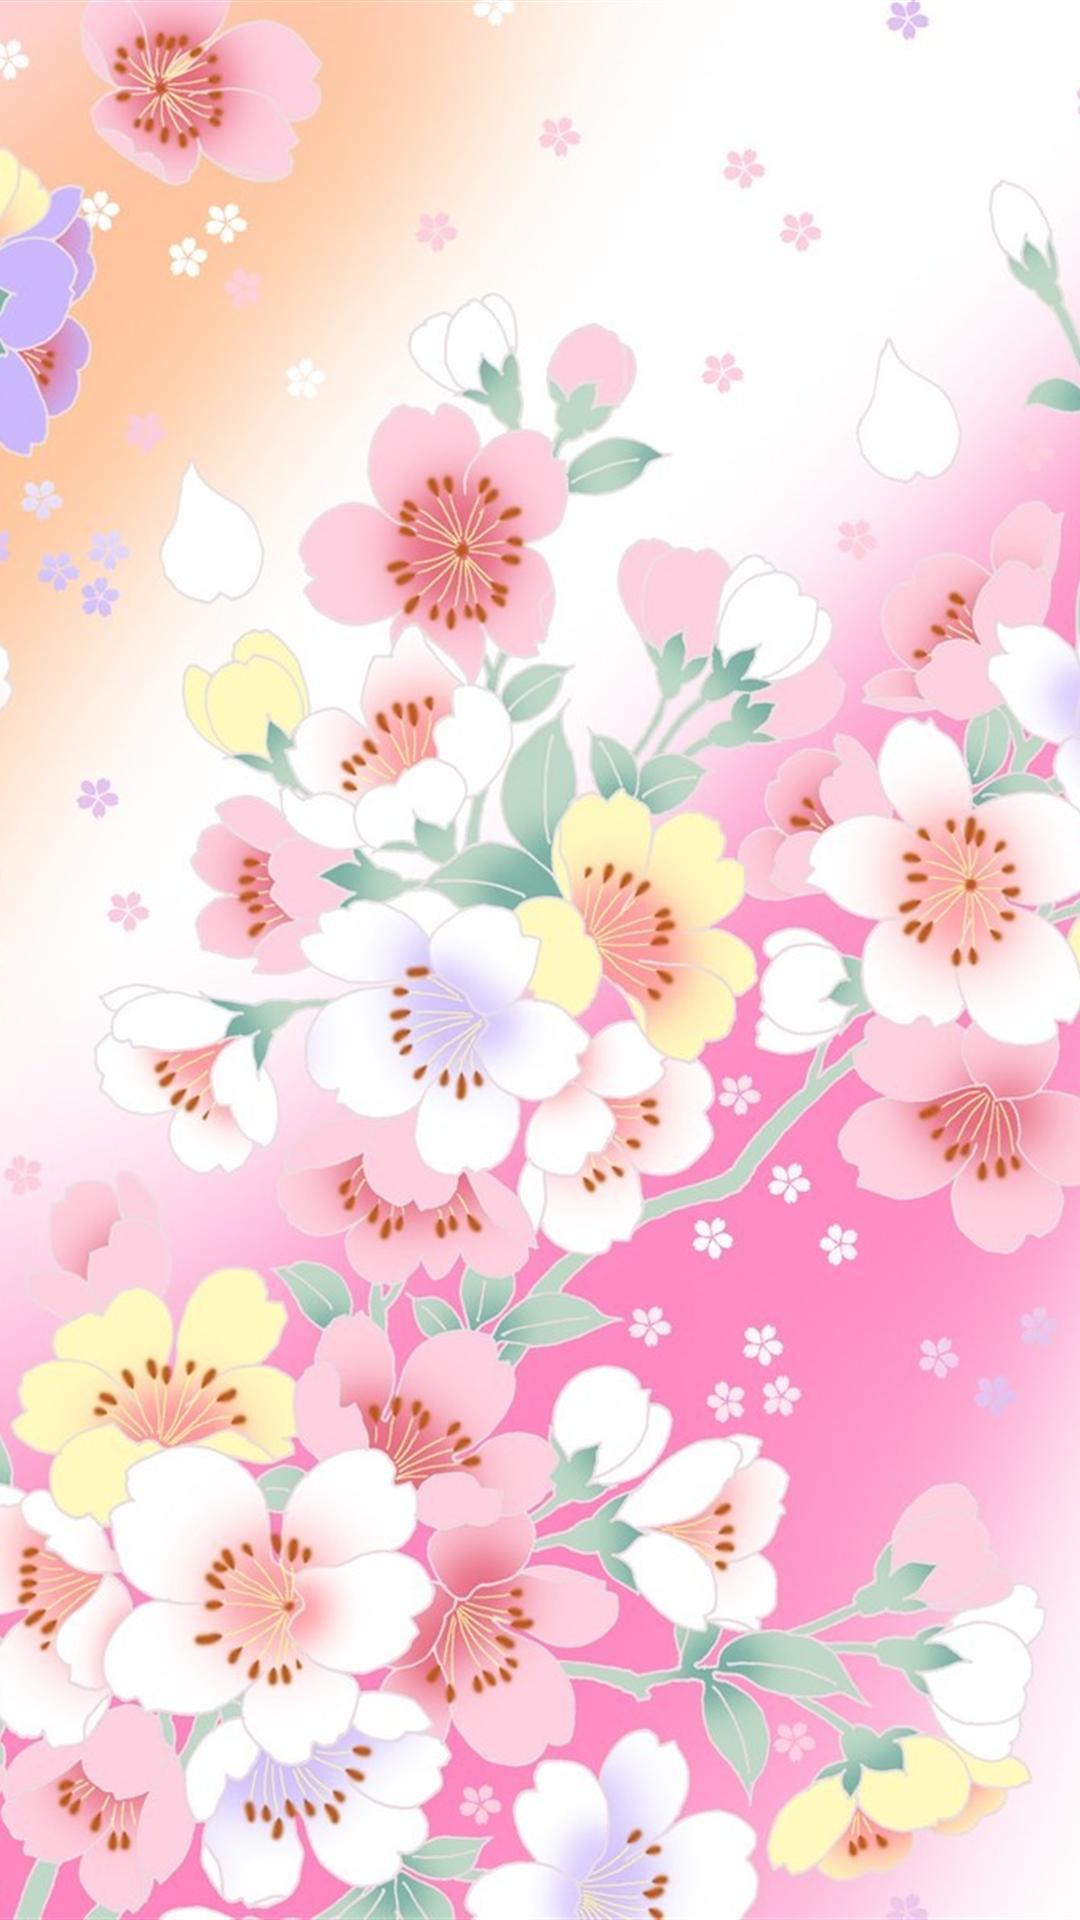 Cute Wallpaper Phone Case Floral Iphone Backgrounds Pixelstalk Net